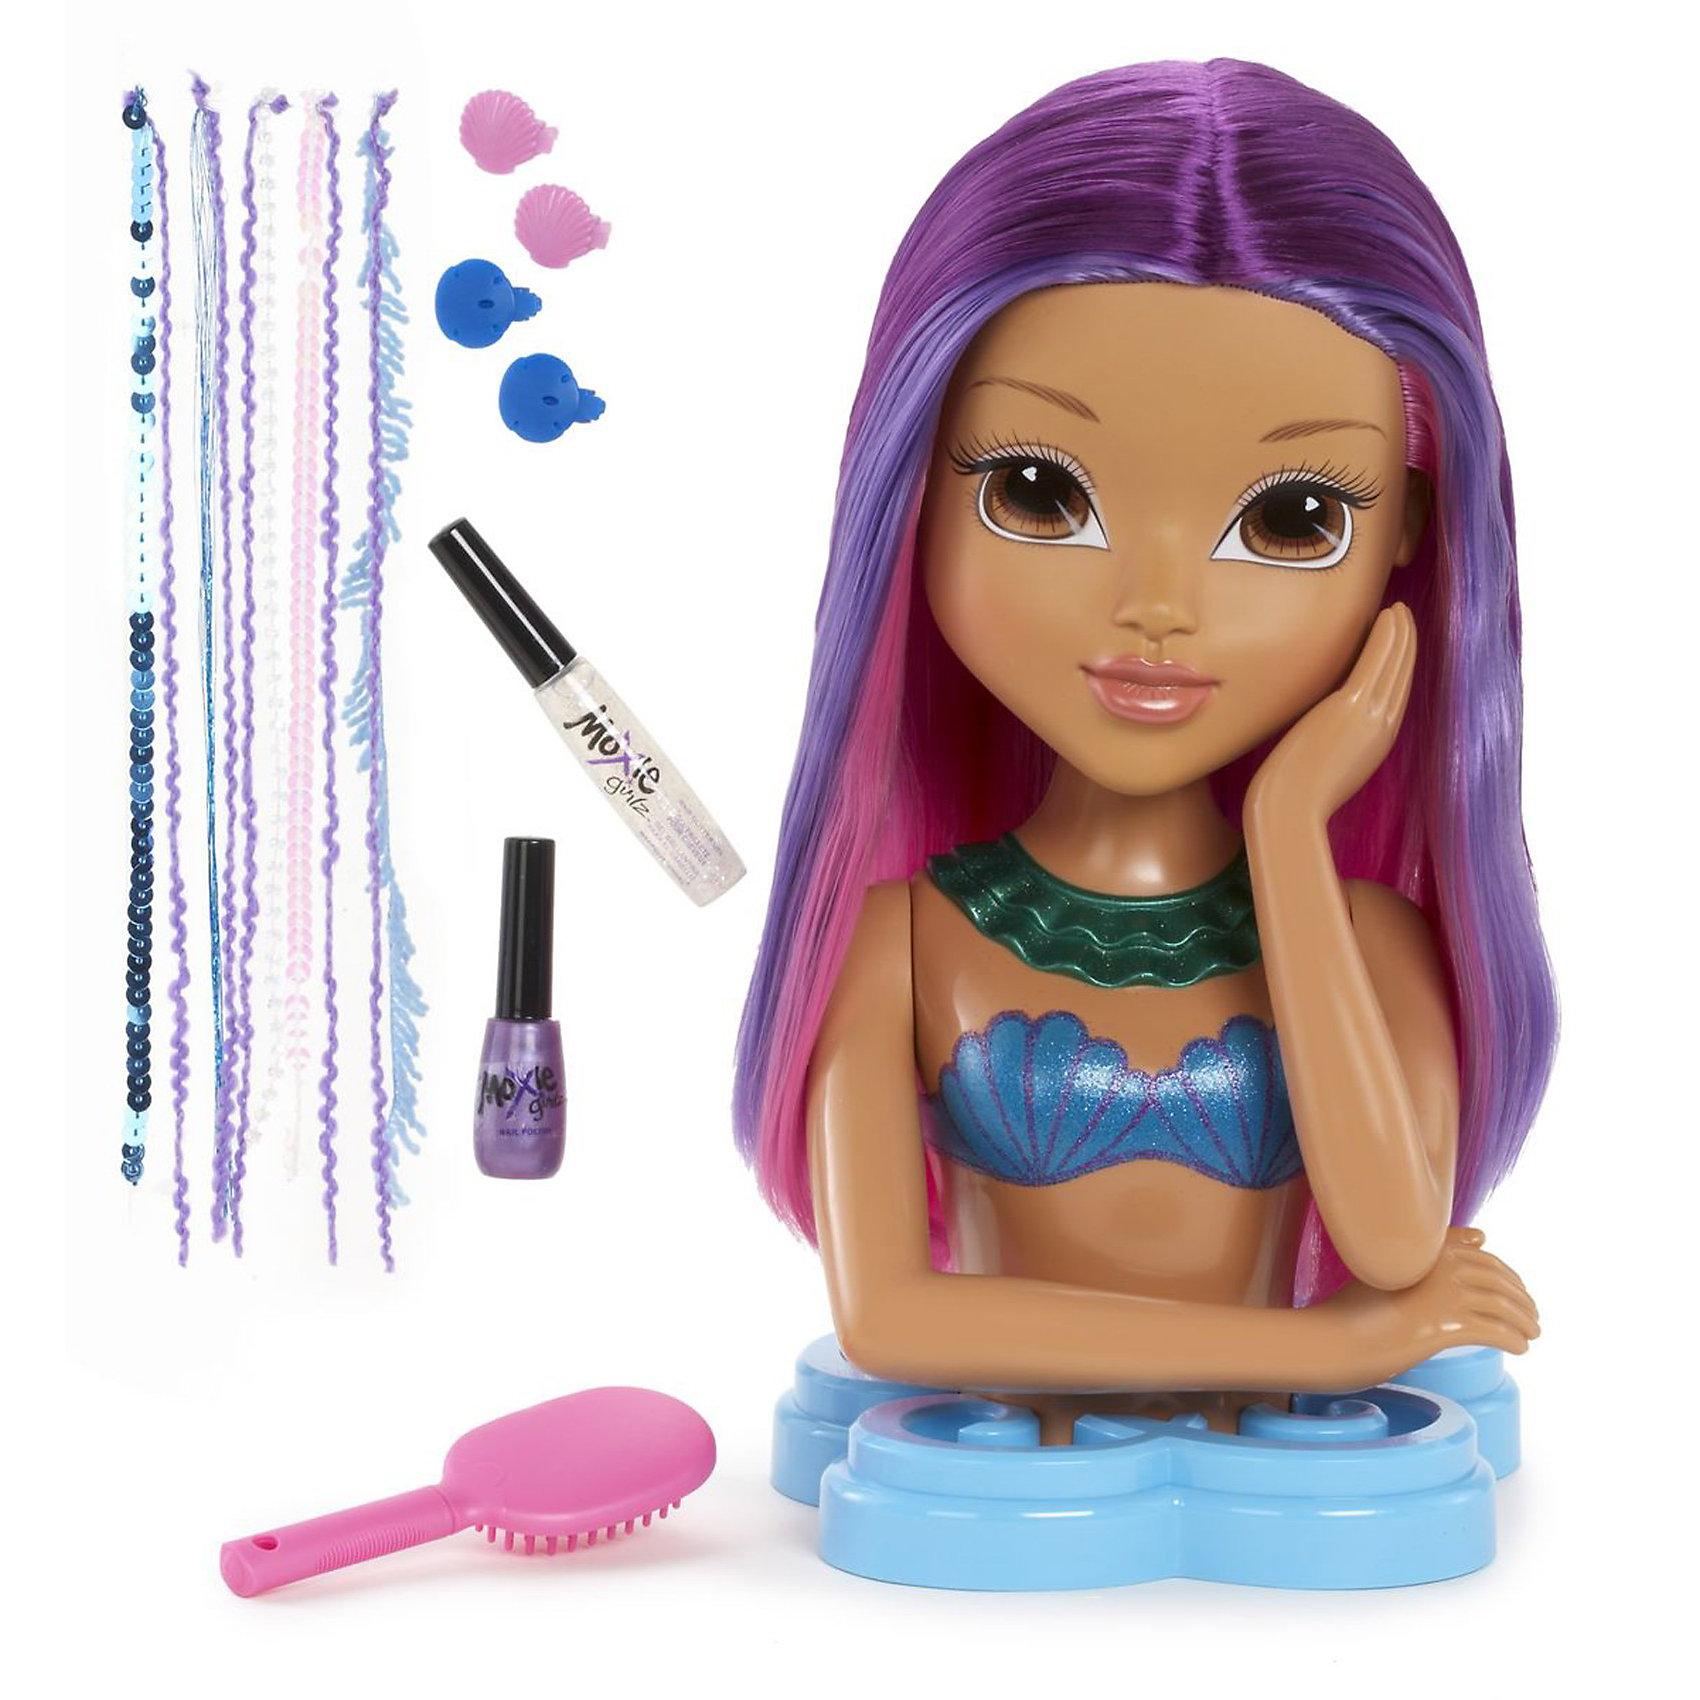 Торс куклы Софина Морские красавицы, Moxie